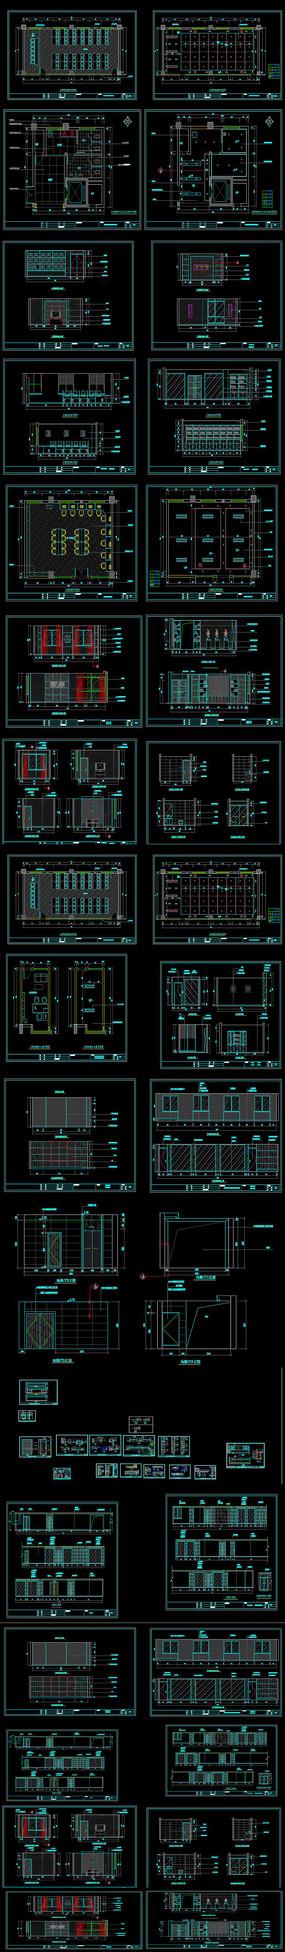 社区办公室CAD施工图 dwg